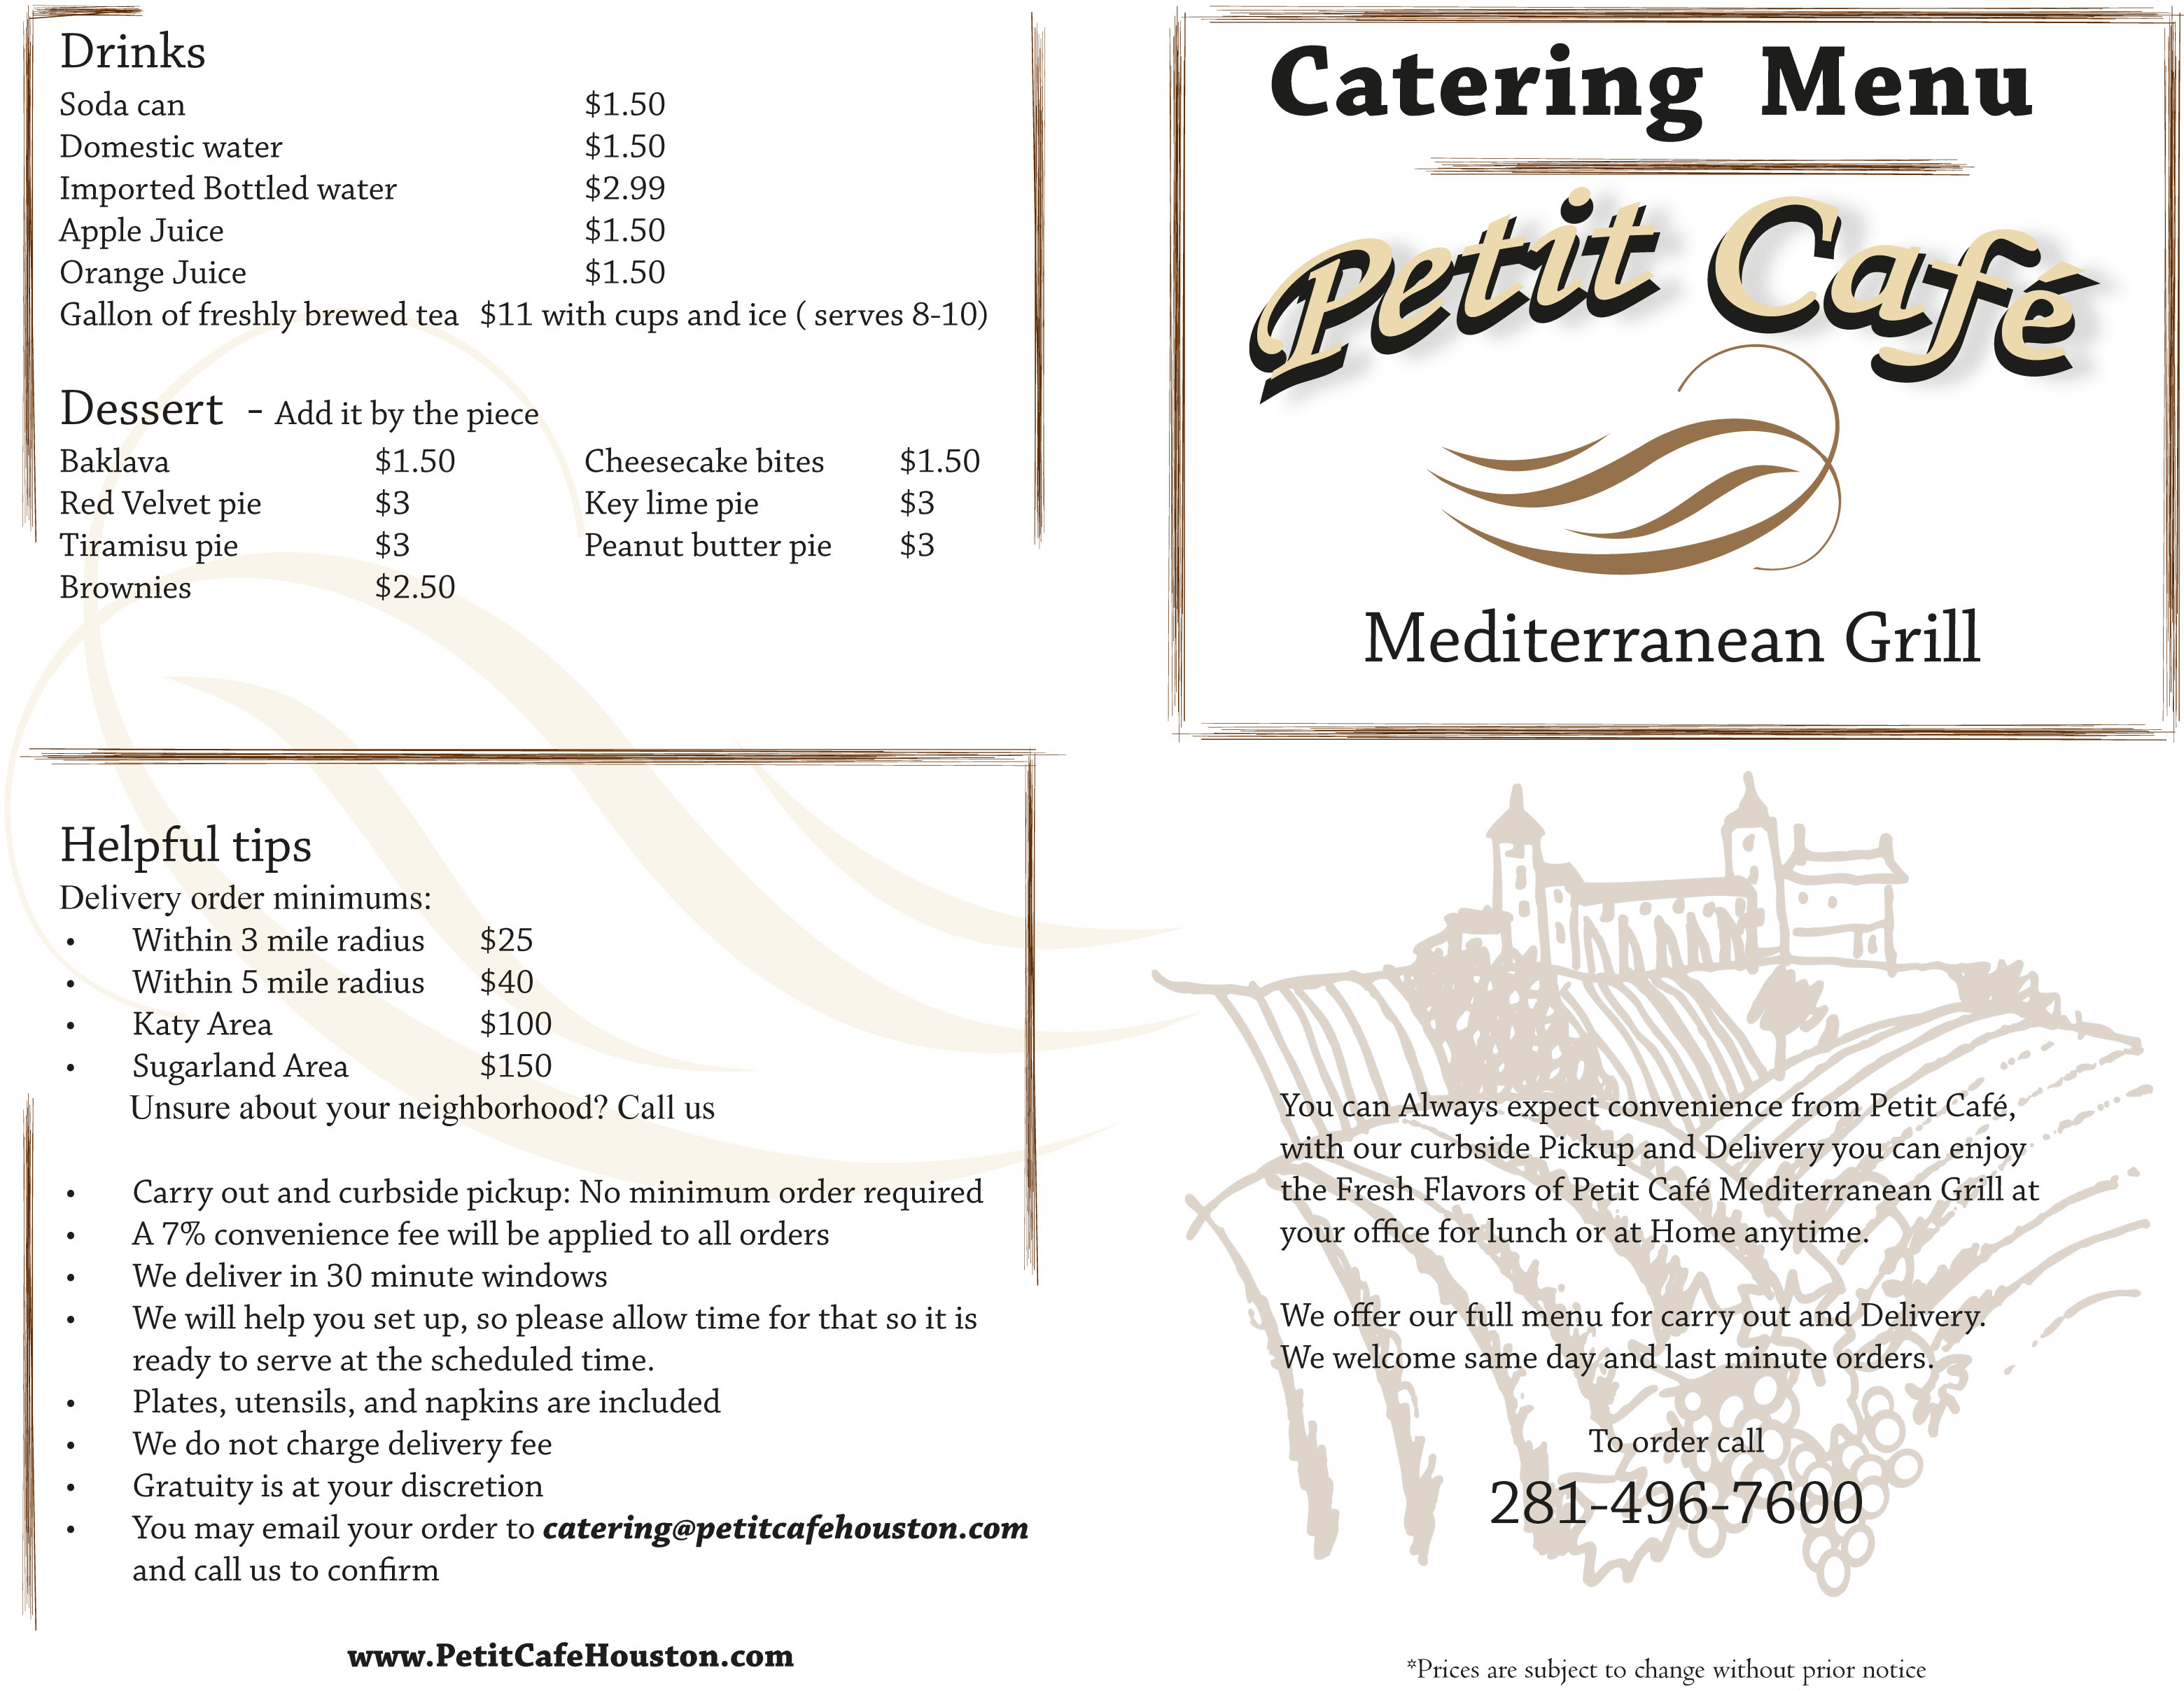 Petit Cafe Lebanon Menu